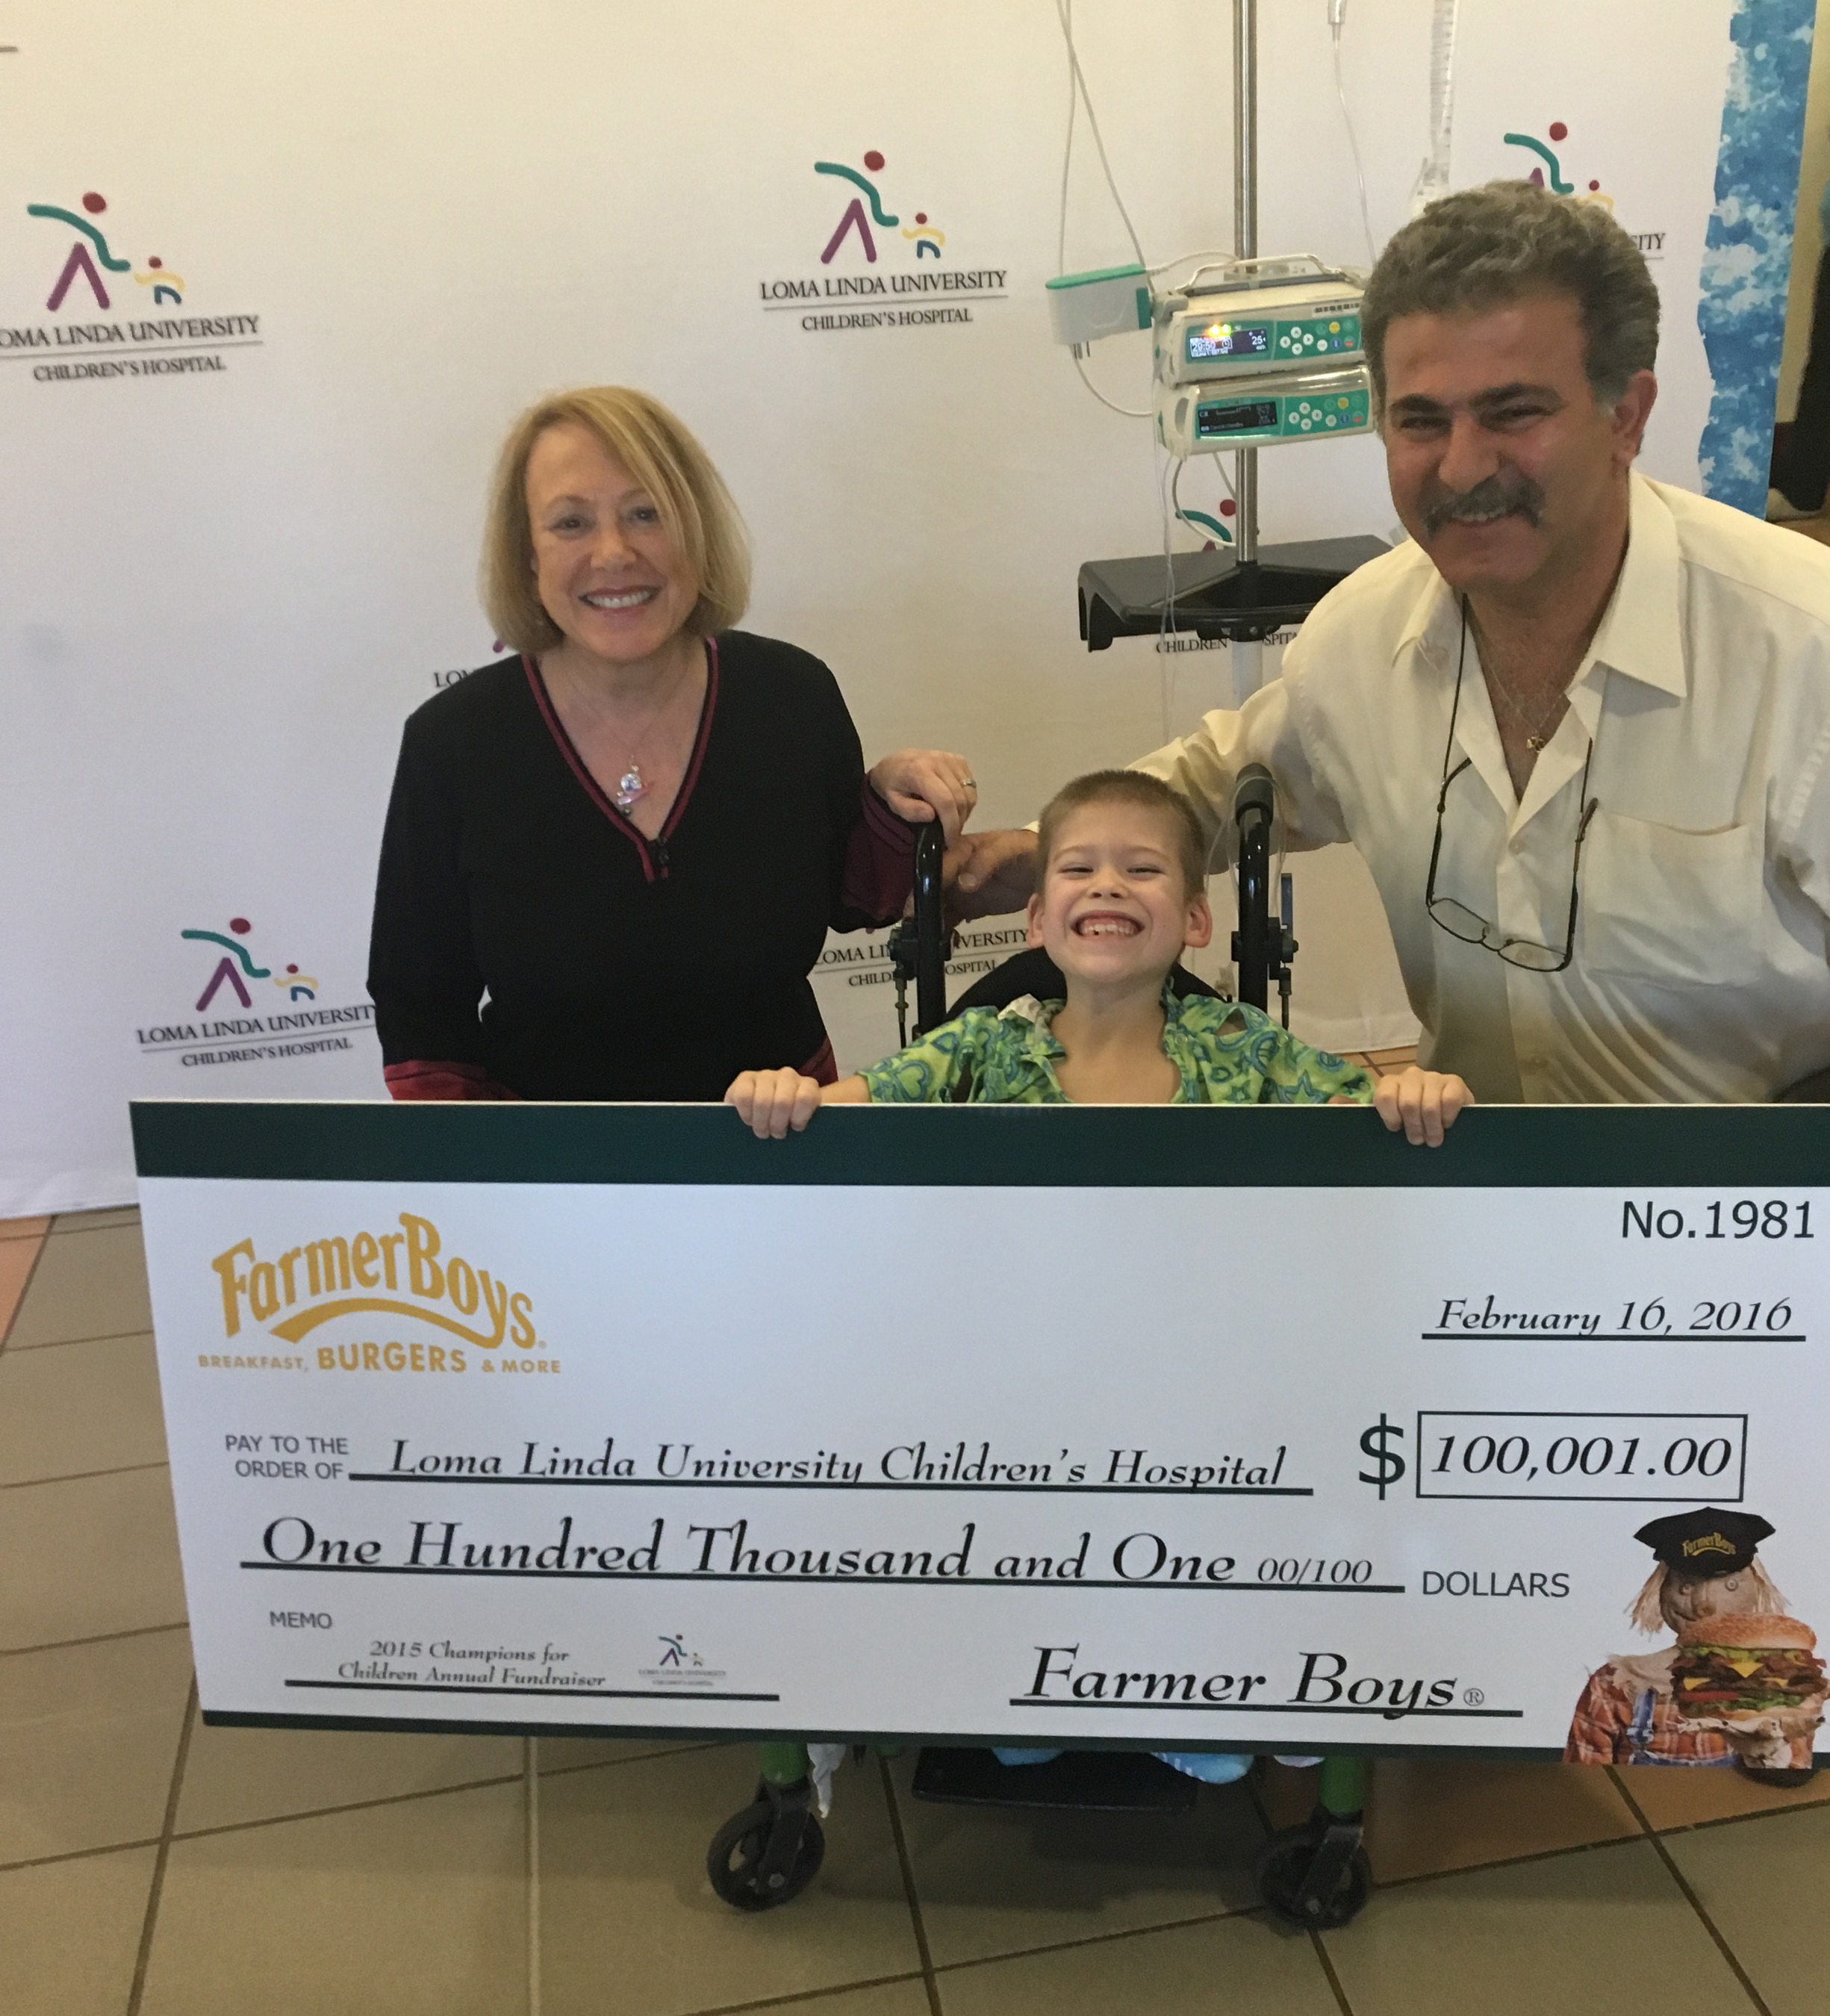 Farmer Boys Donates Over $100,000 to Loma Linda University